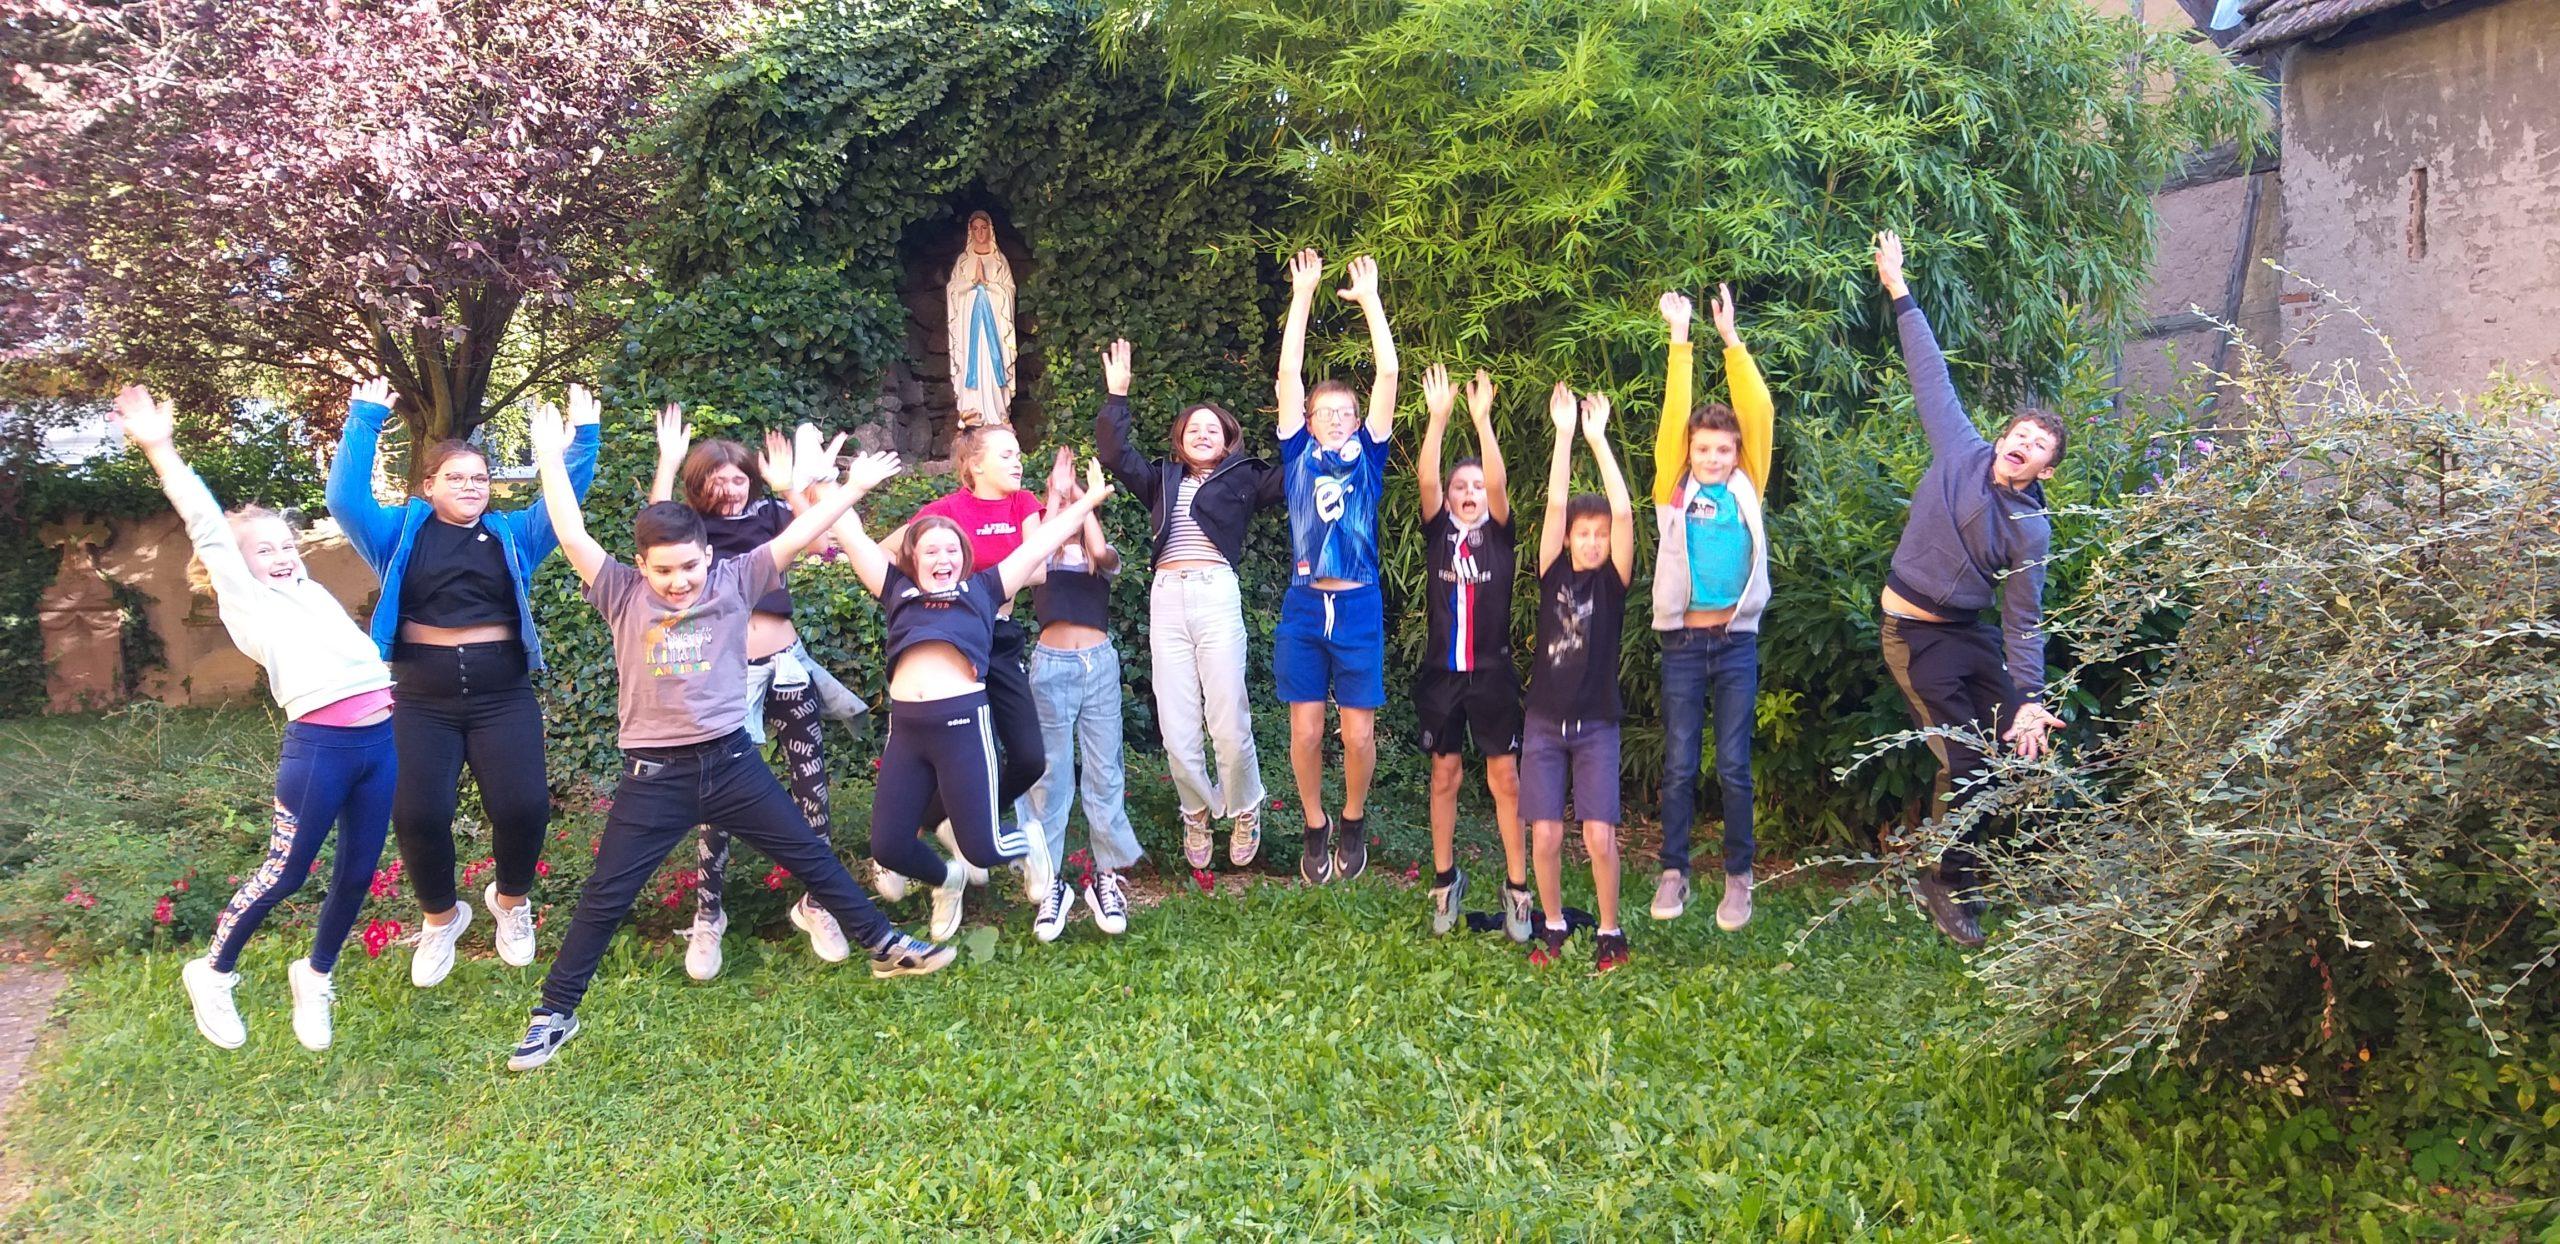 Matzenheim - Rencontre des servants d'autel - 27 août 2021